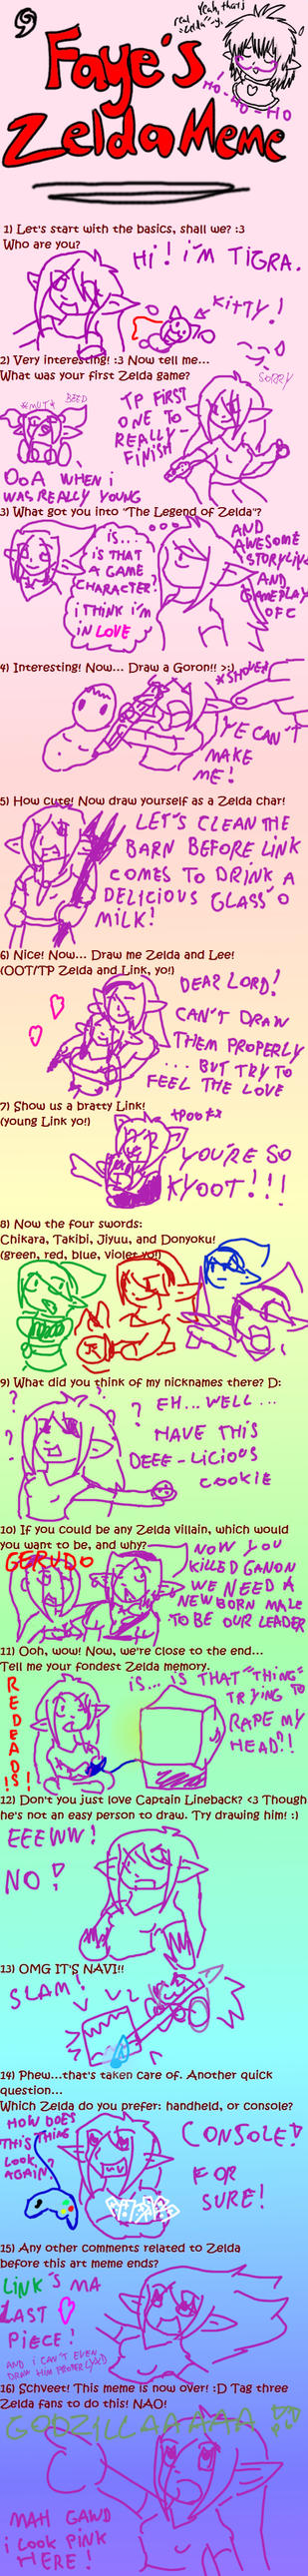 Zelda Art Meme by Tigra-kitty